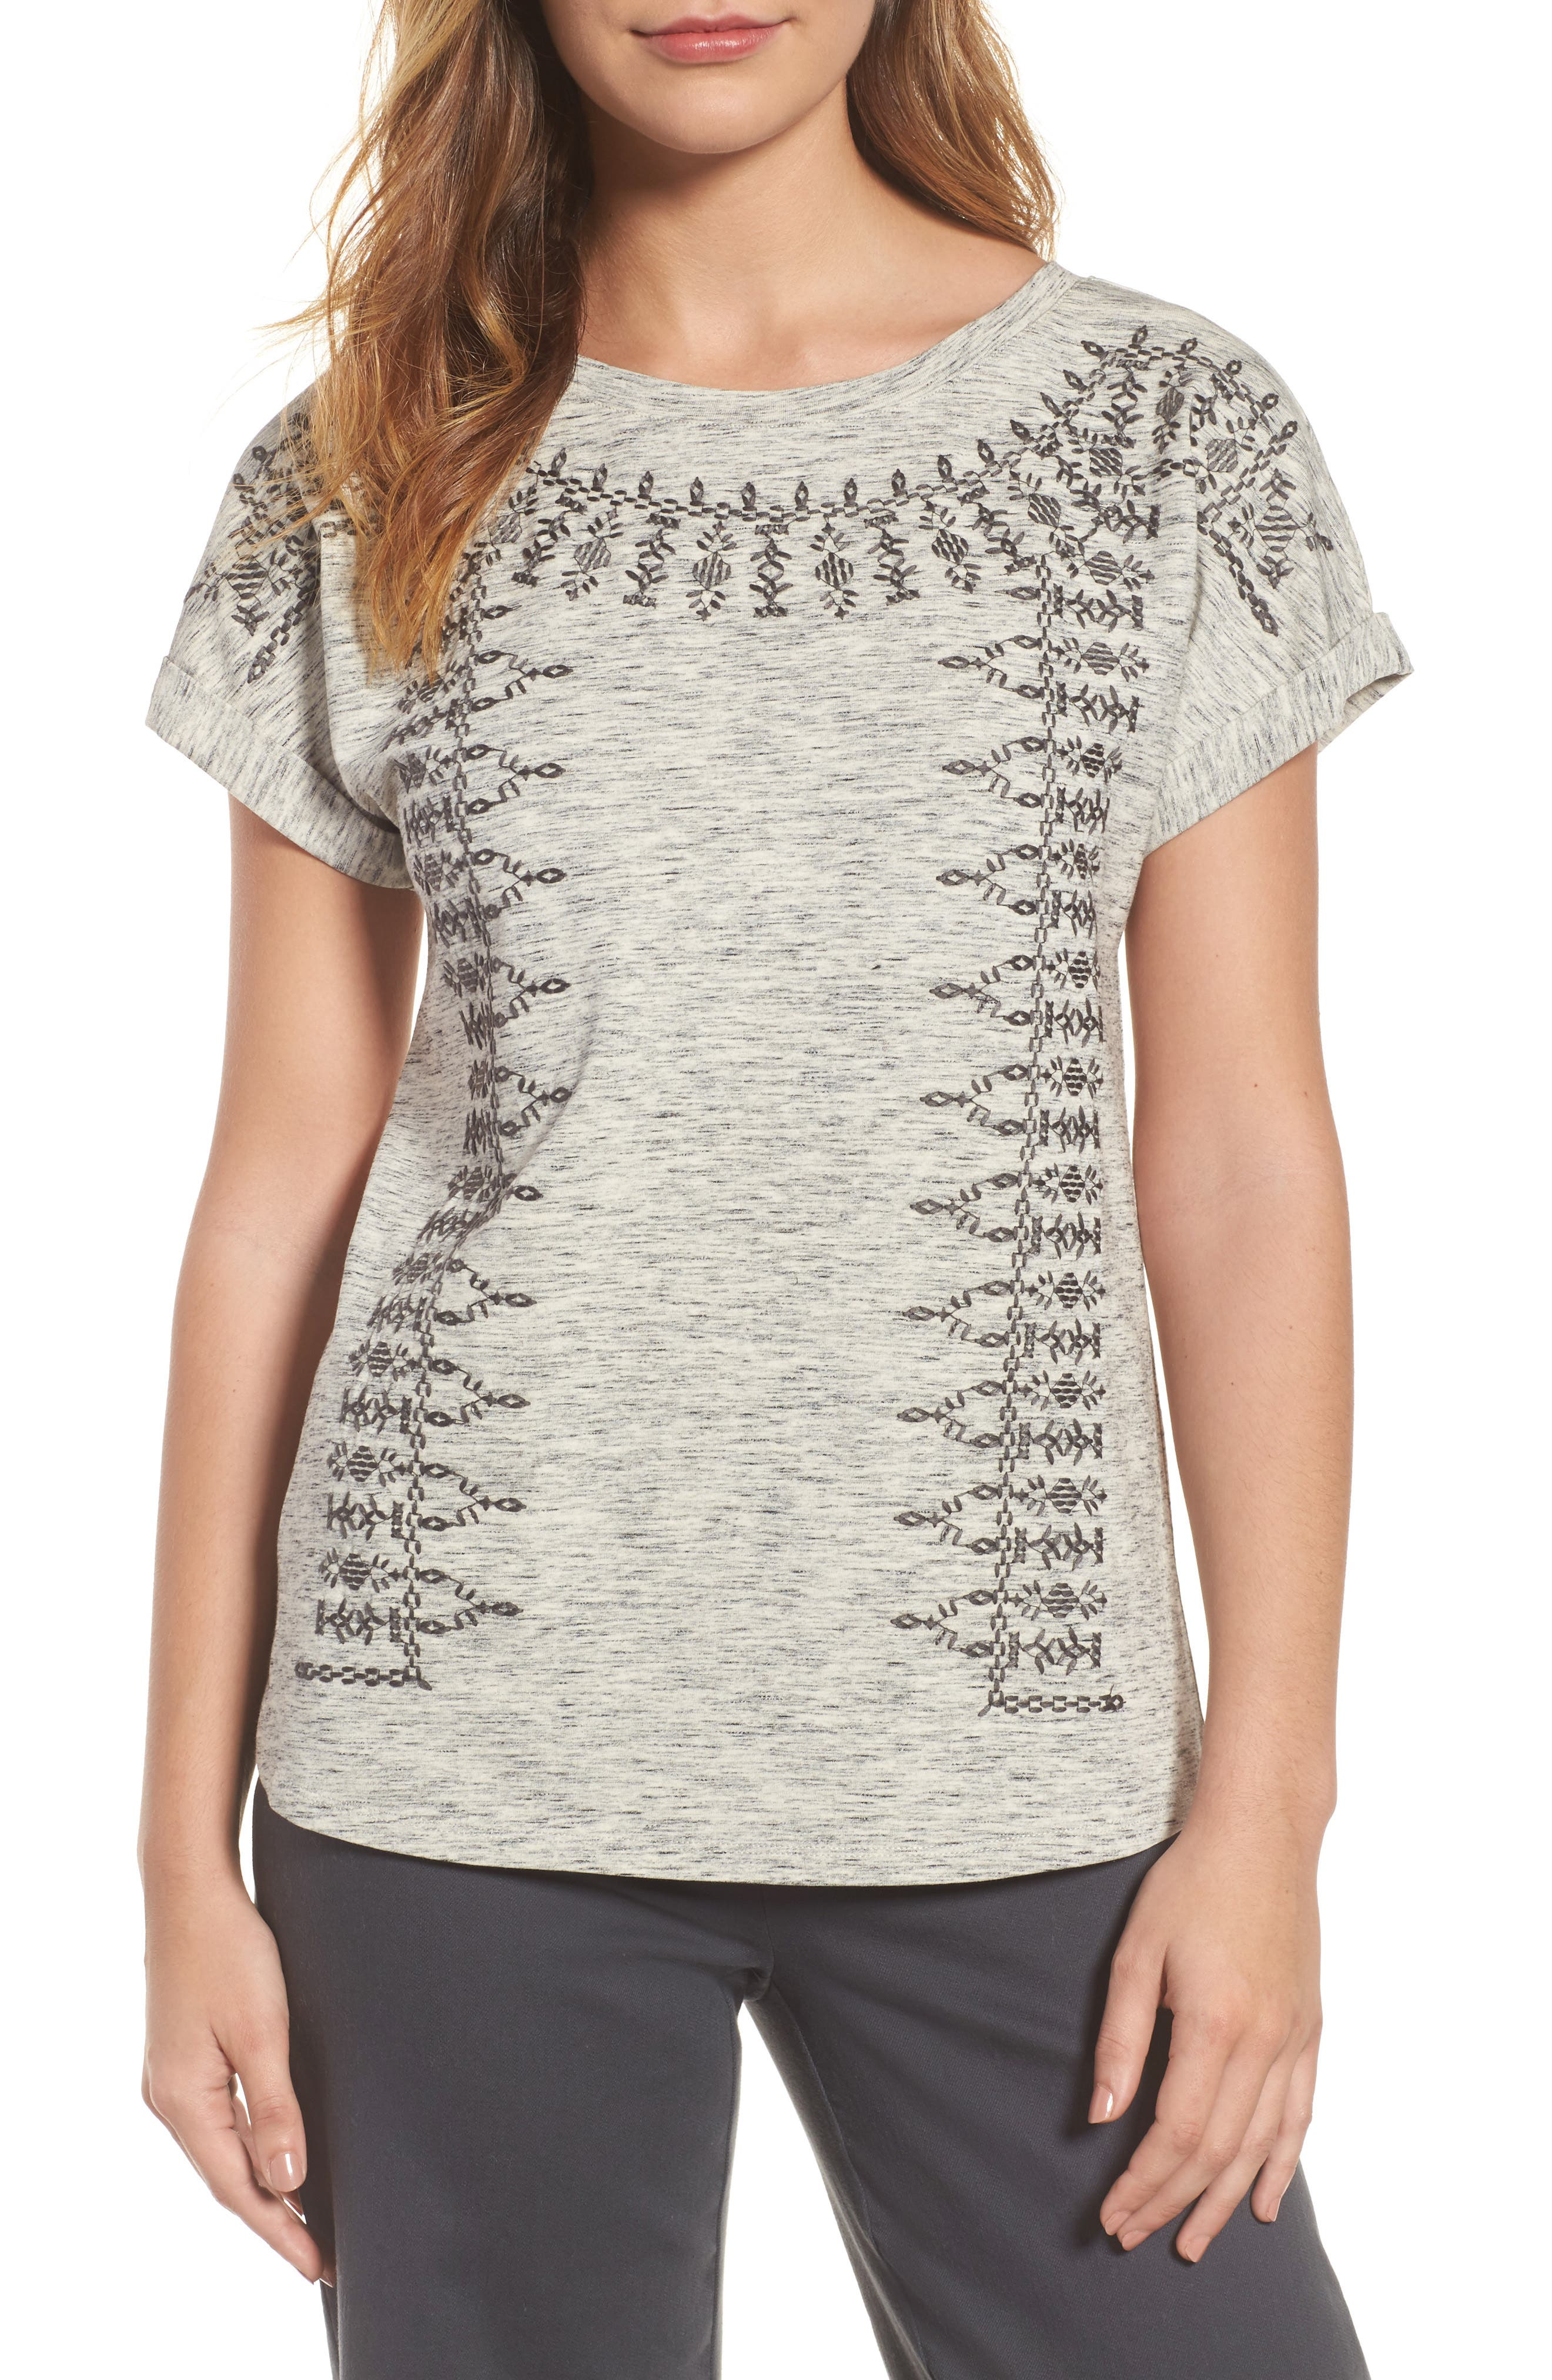 Alternate Image 1 Selected - NIC+ZOE Henna Short Sleeve Top (Regular & Petite)